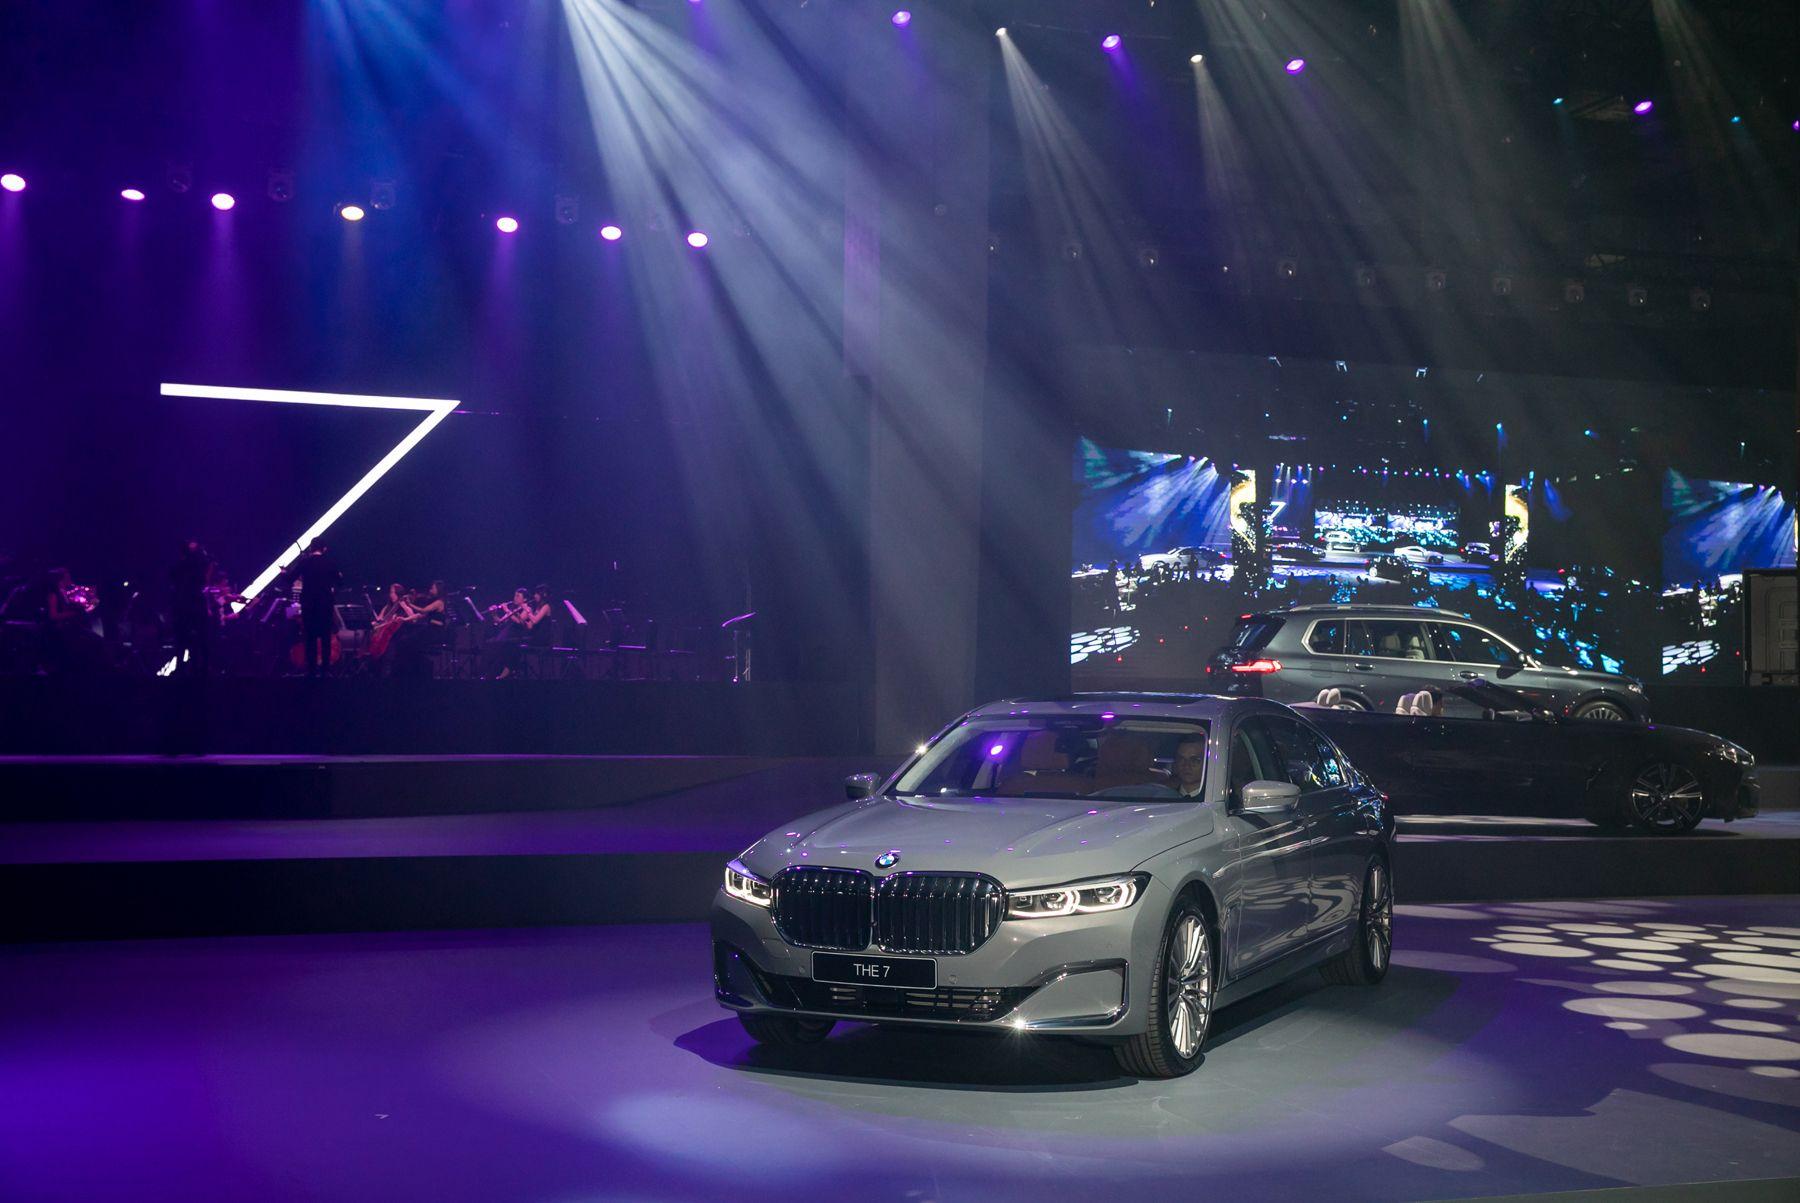 BMW 7系列小改款霸氣登場!格柵加大車頭調高,數位虛擬座艙直覺好上手